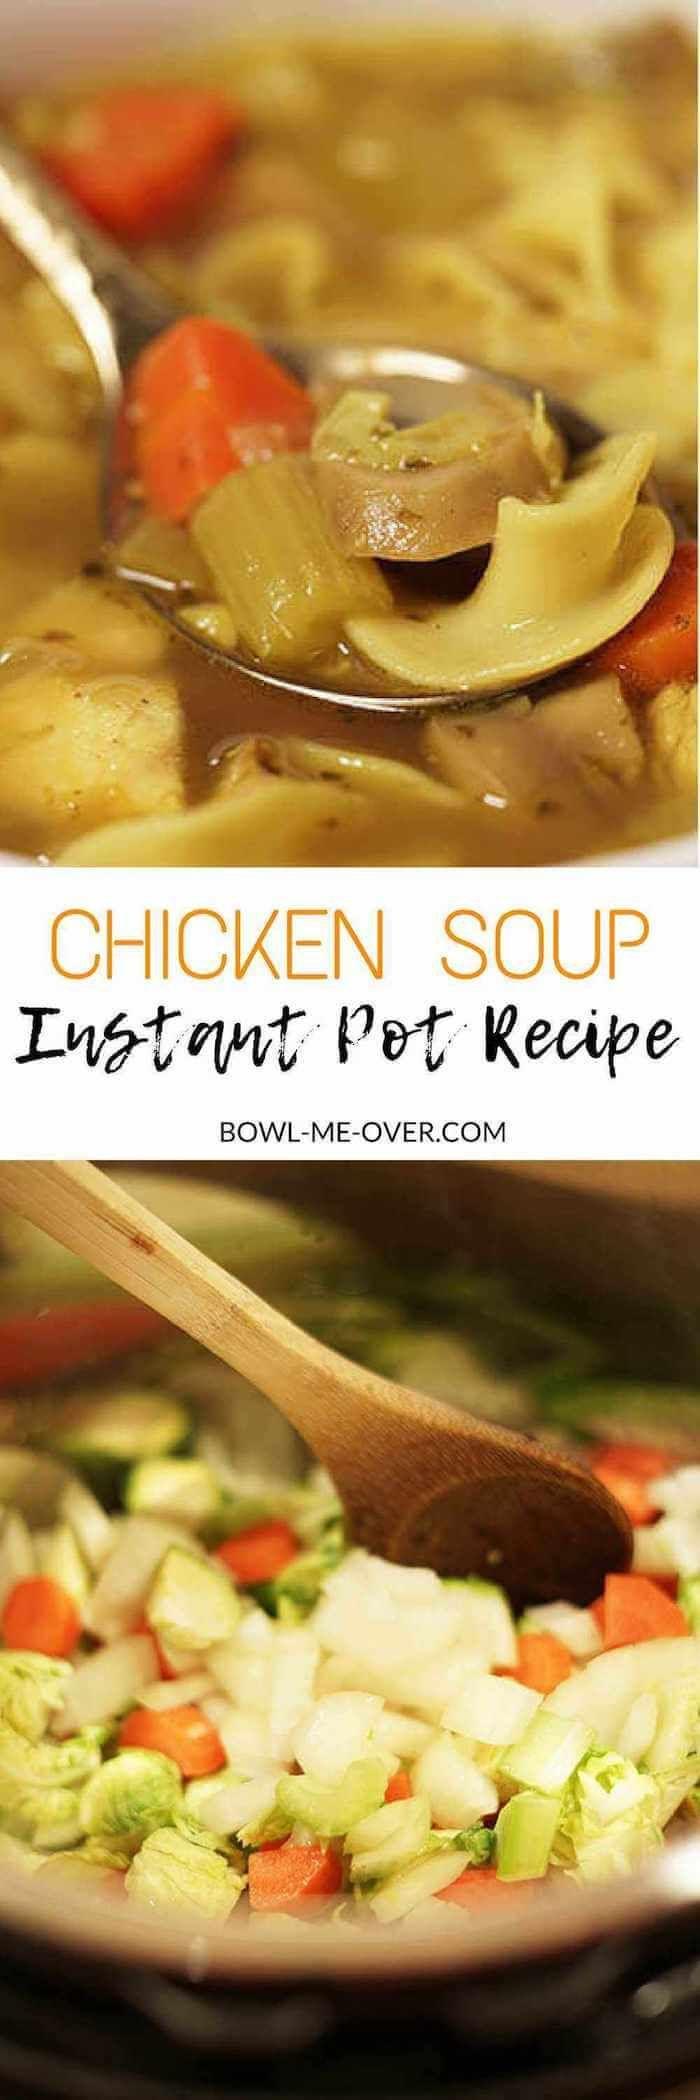 Chicken Soup Instant Pot Recipe Soup Is Good Food Pinterest